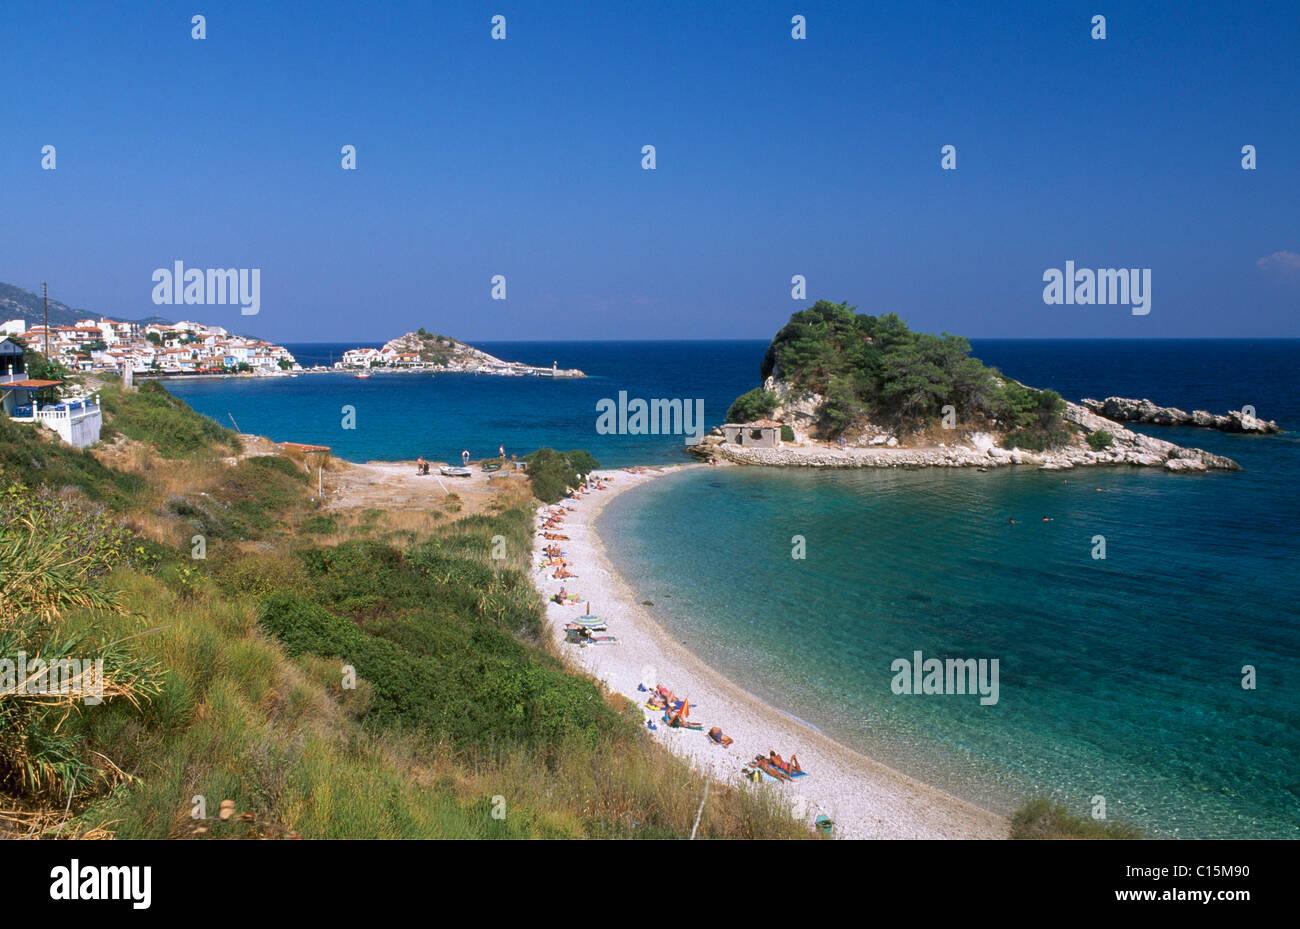 Kokkari Beach, Insel Samos, Griechenland, Europa Stockbild